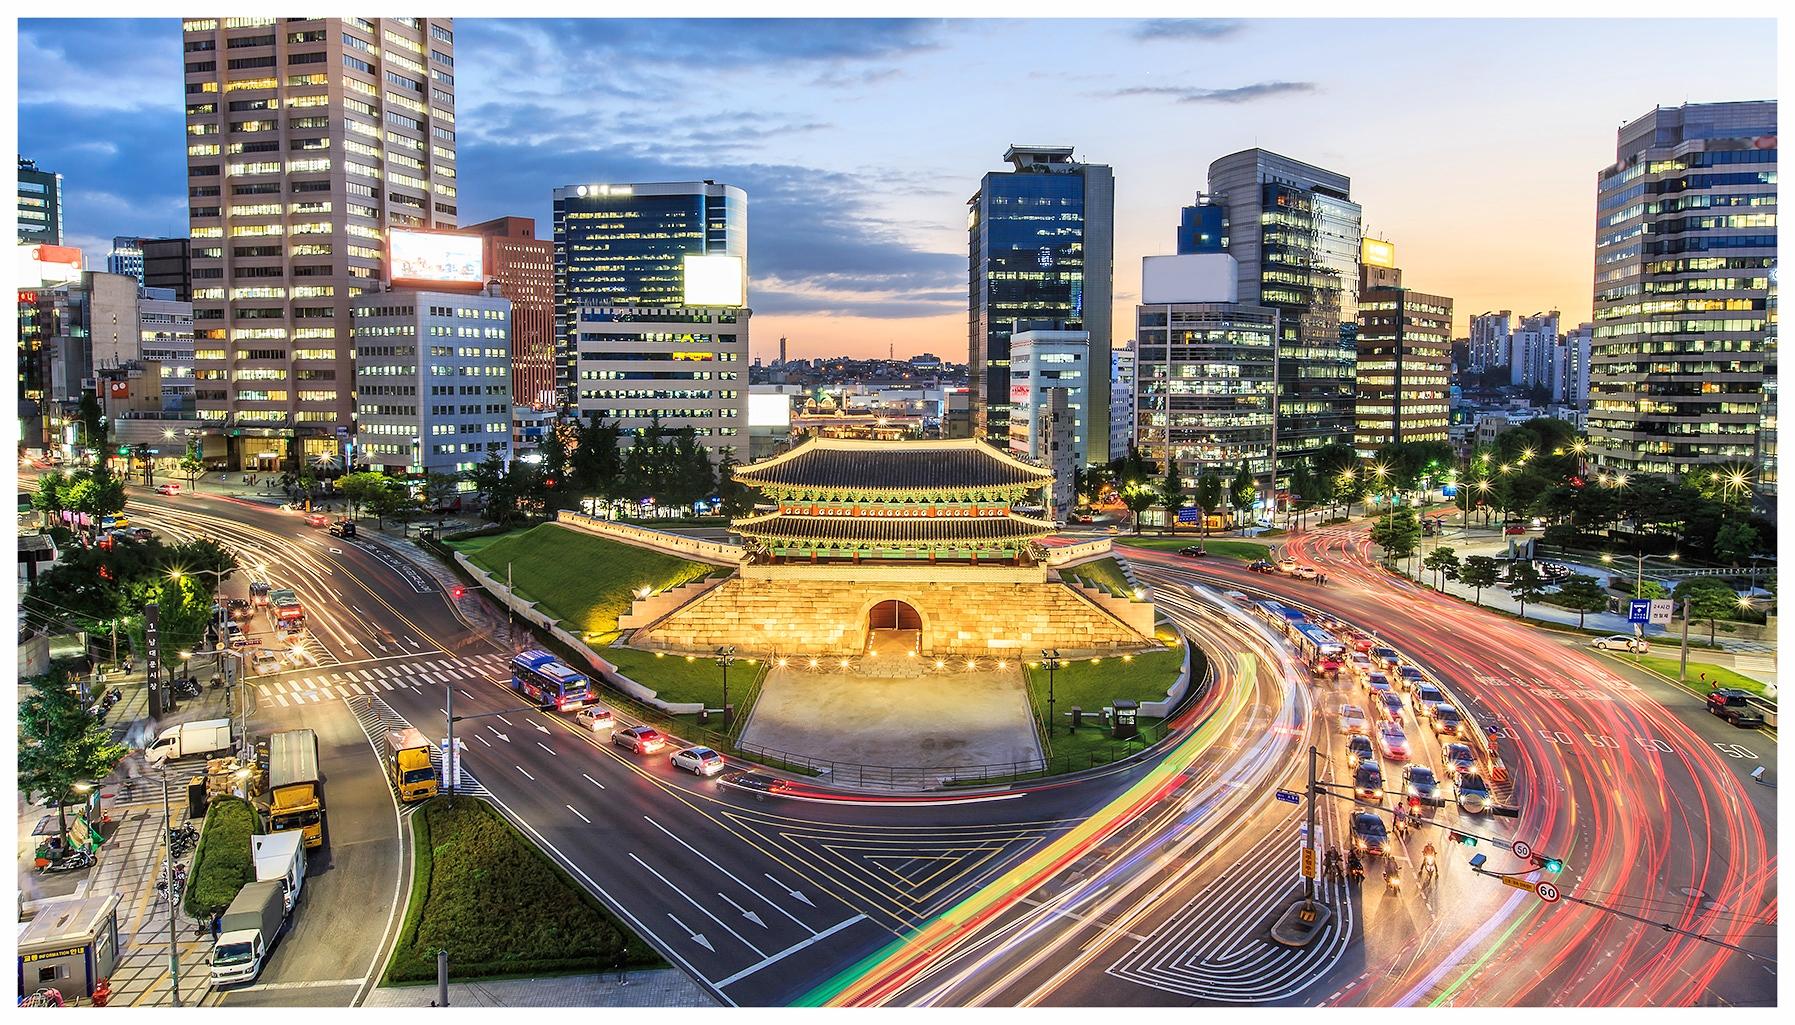 Seoul Downtown.jpg